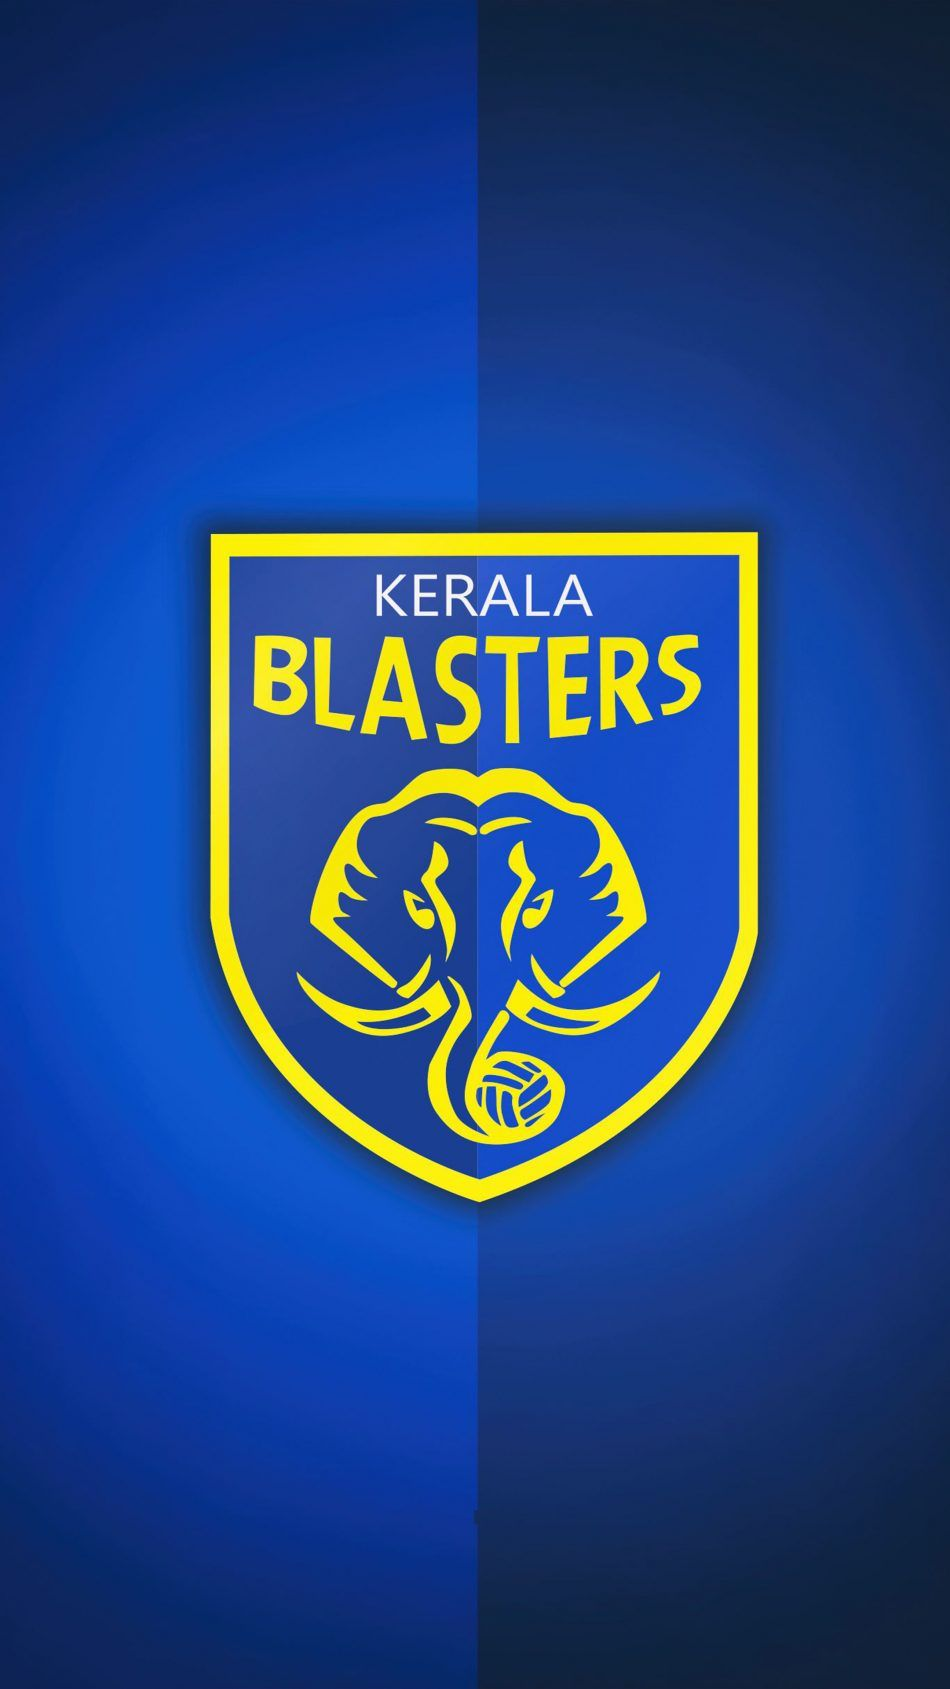 Kerala Blasters 2018 Sports Wallpapers Kerala Kerala blasters 950x1689